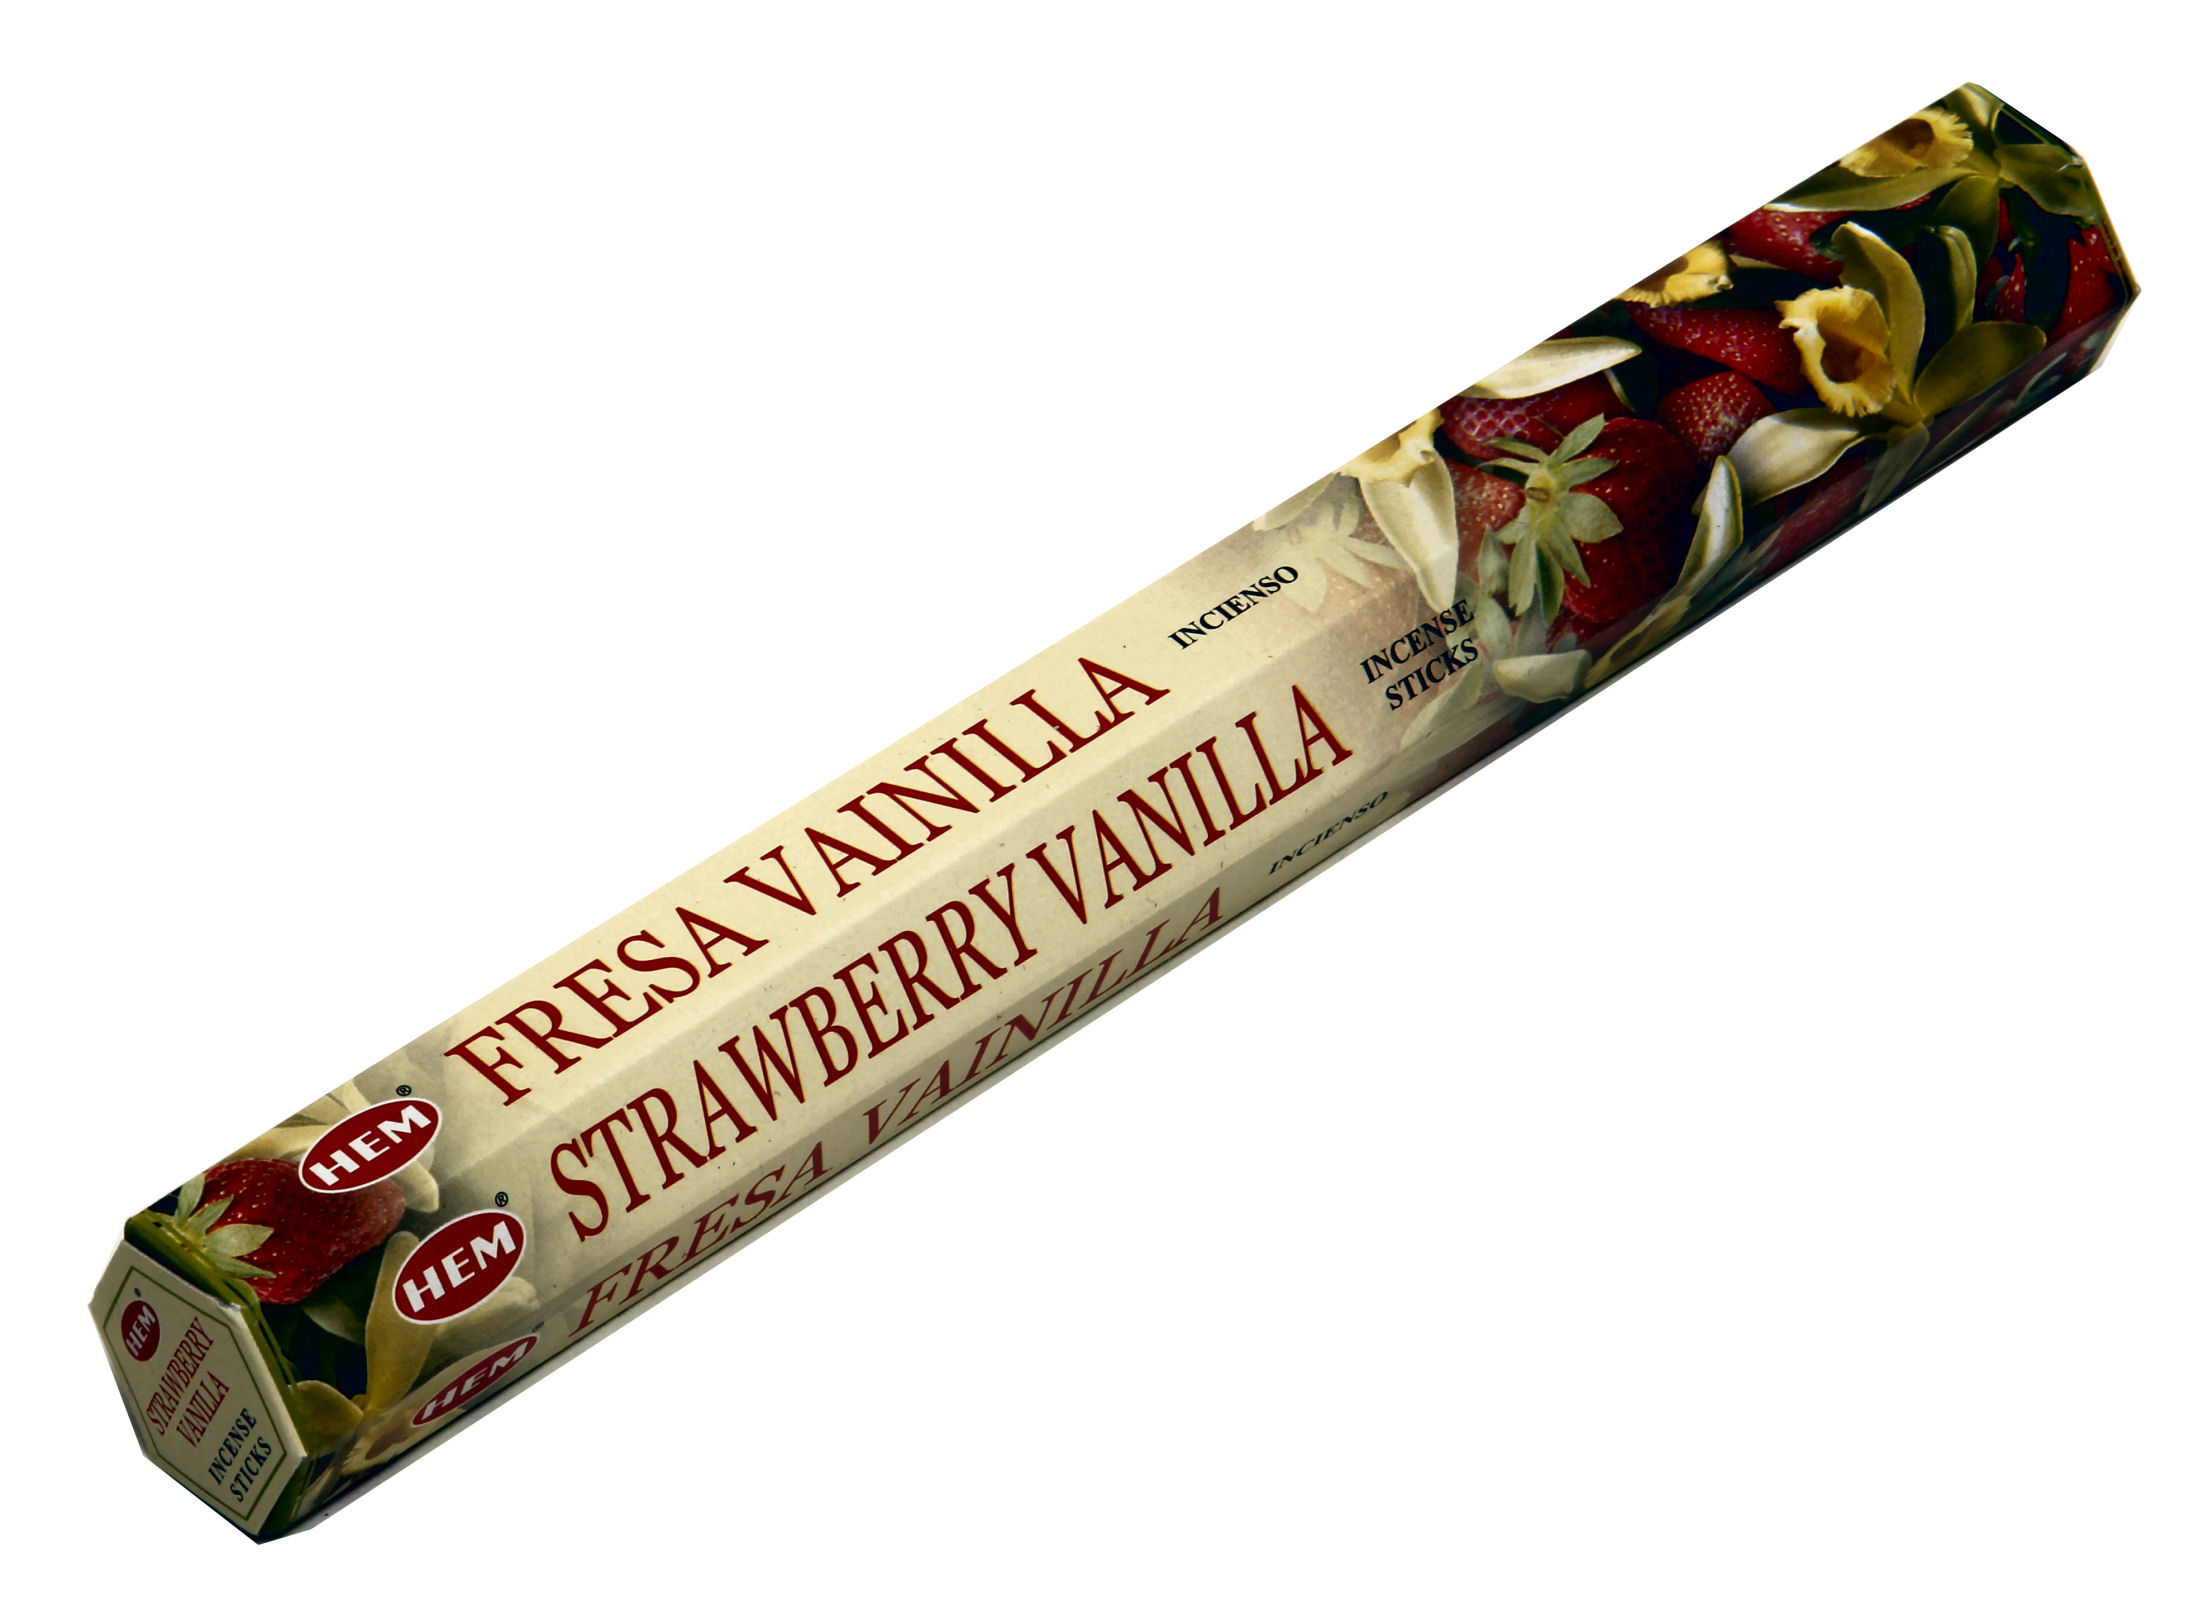 HEM Räucherstäbchen Strawberry Vanilla 20g Hexa Packung  Ca. 20 Incence Sticks